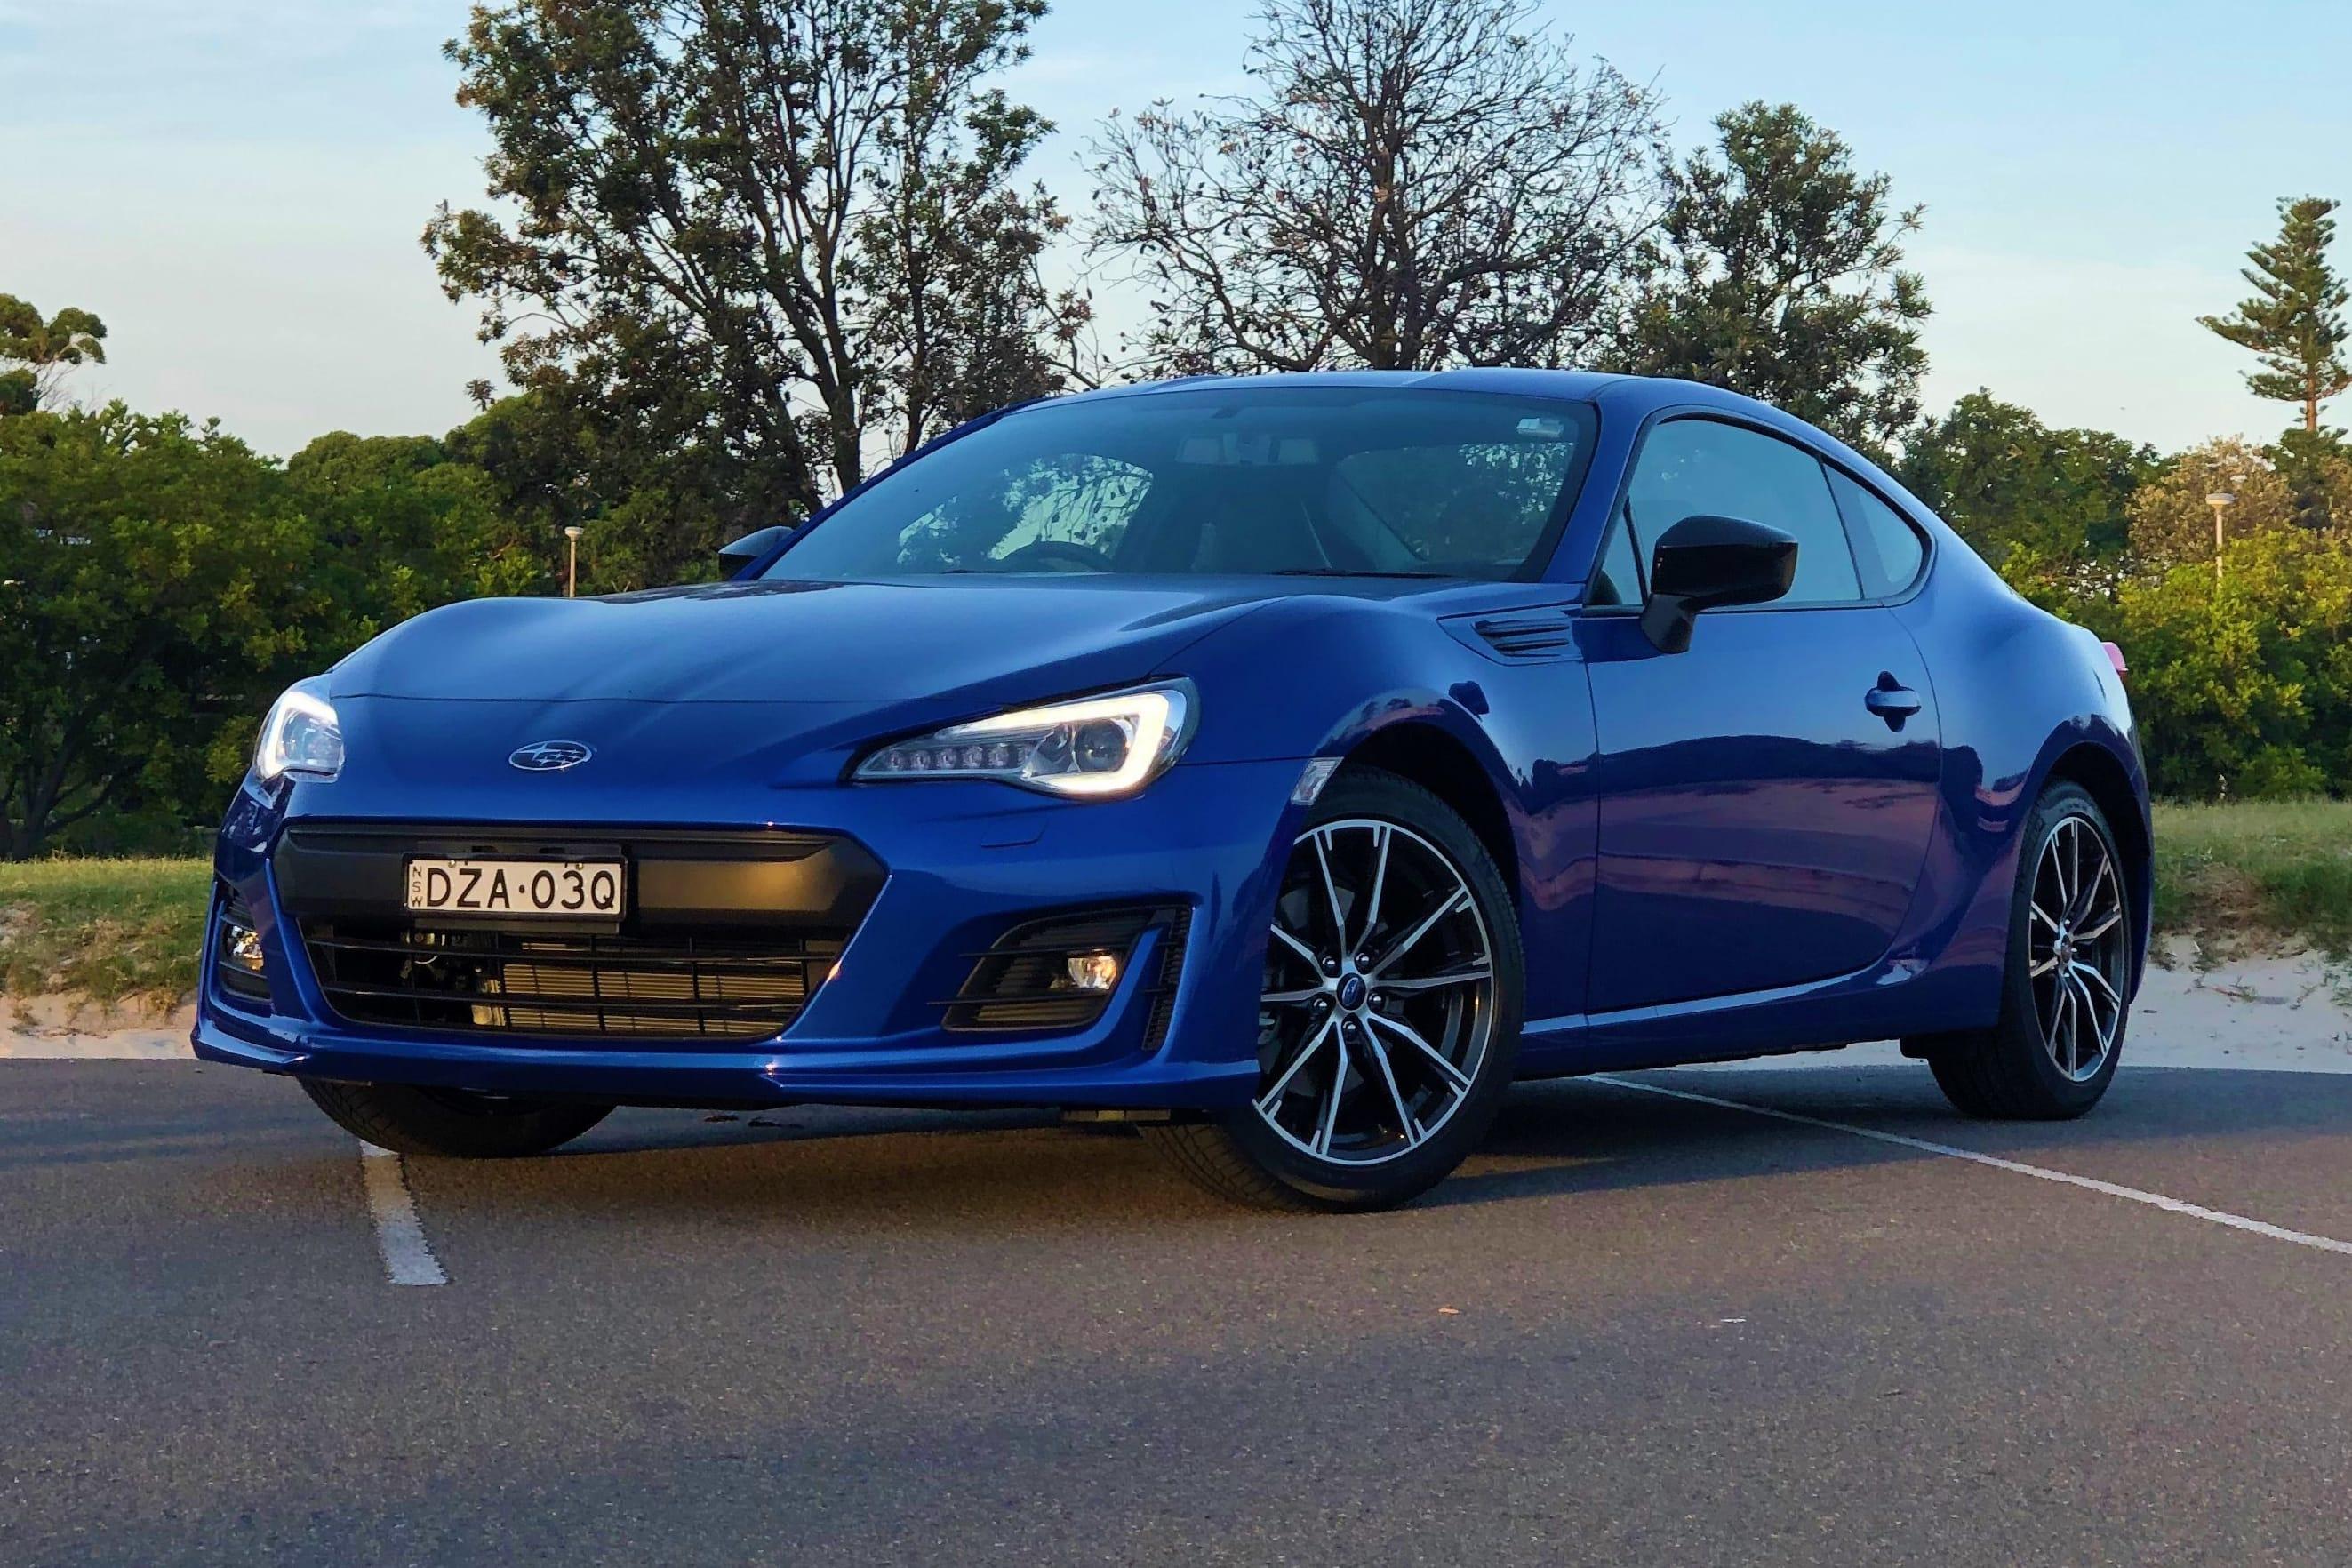 Hyundai Kona 2021 review: Elite snapshot | CarsGuide